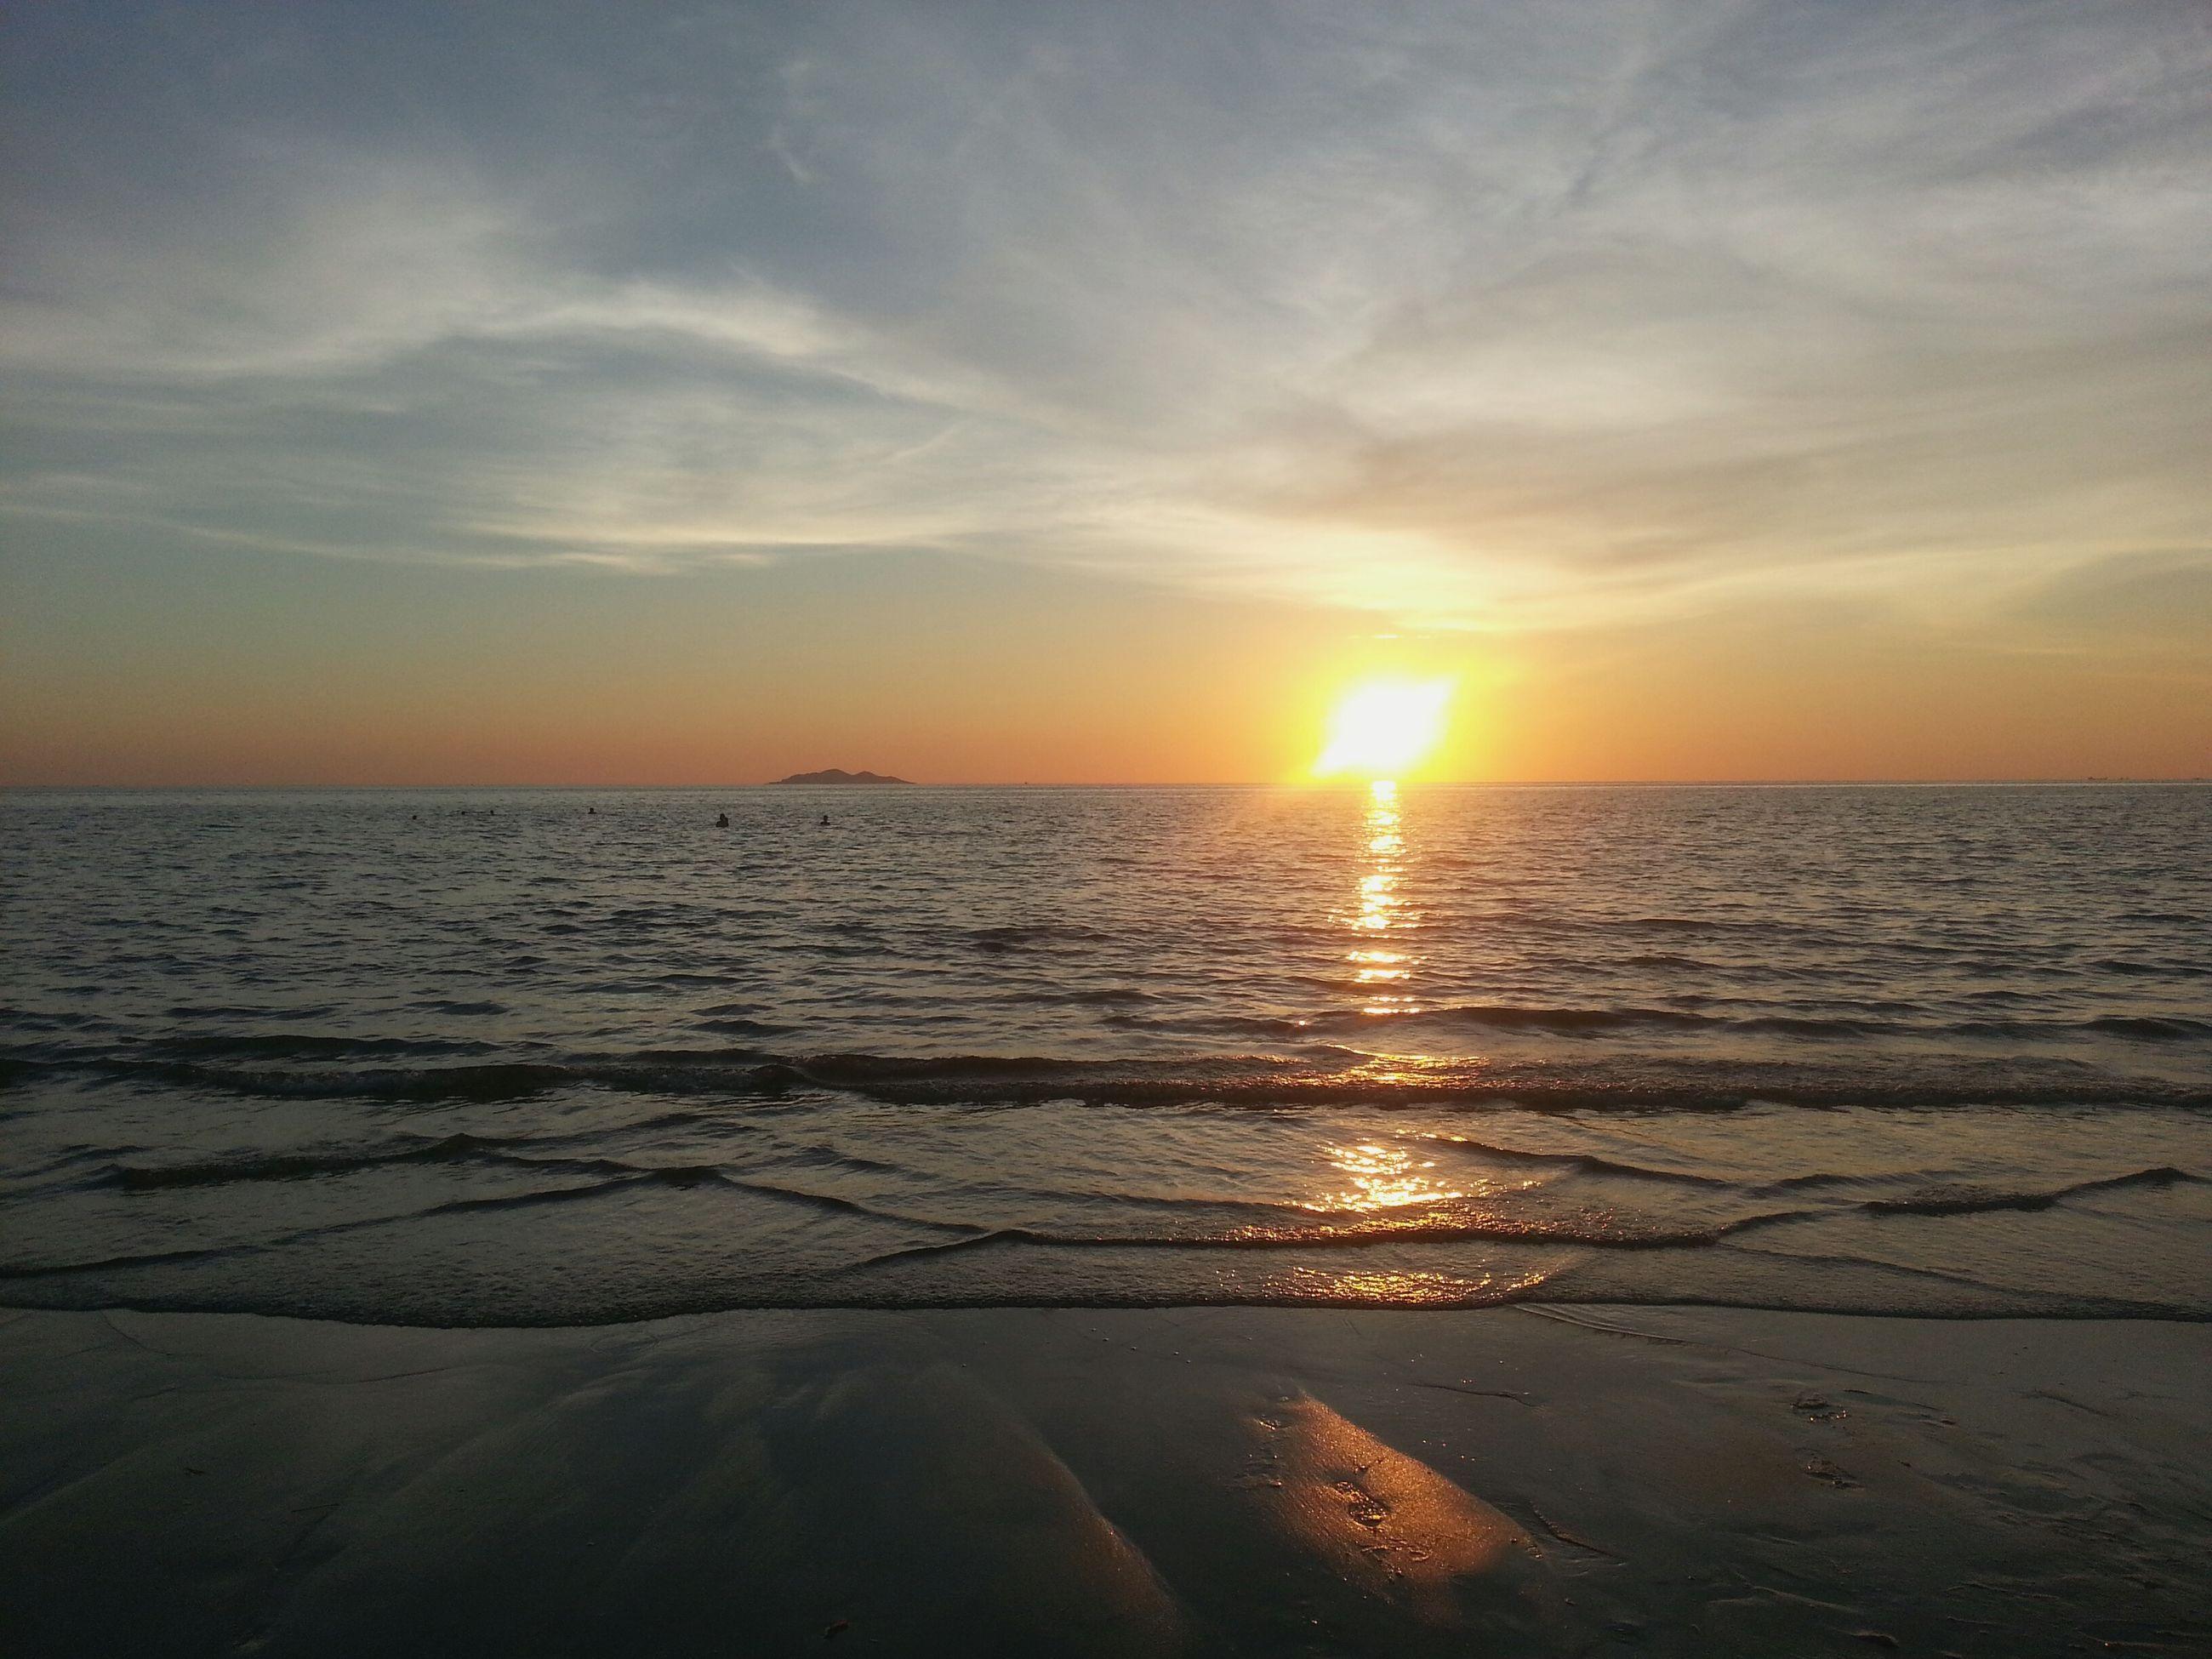 sunset, sea, sun, water, horizon over water, scenics, beach, tranquil scene, beauty in nature, tranquility, sky, shore, orange color, reflection, idyllic, nature, sunlight, cloud - sky, sand, sunbeam